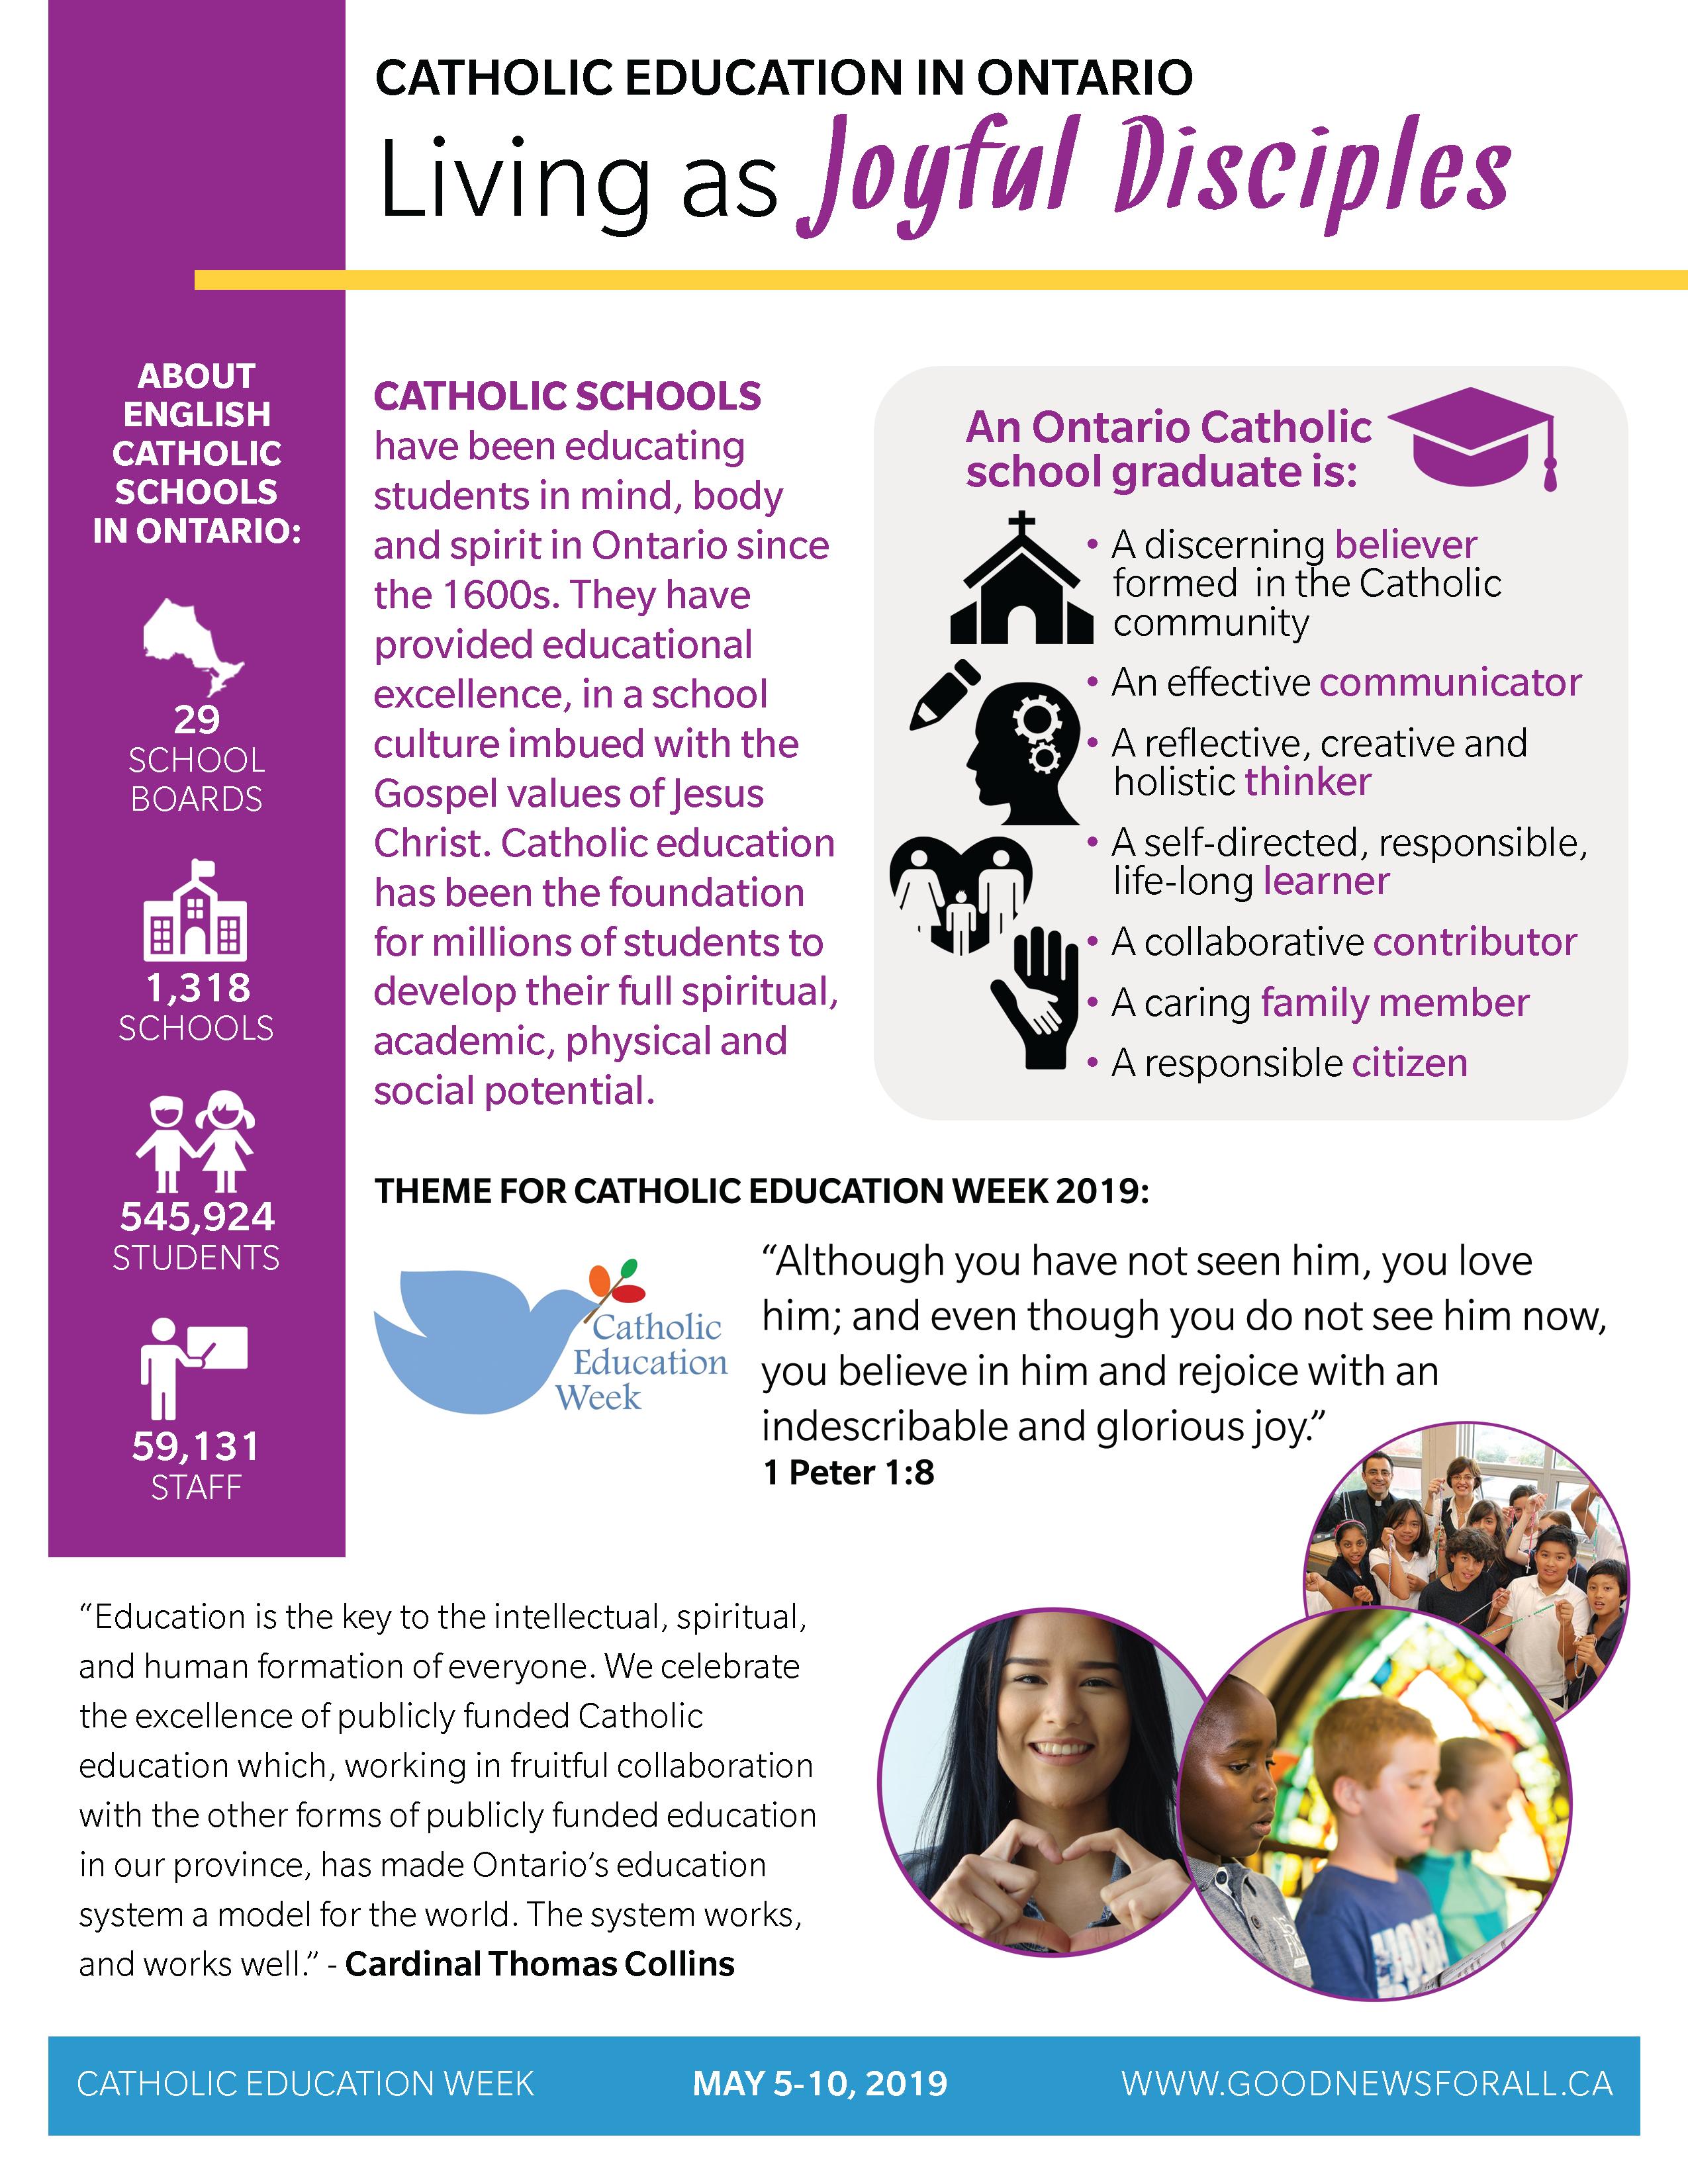 Image of Catholic Education Ontario's Living as Joyful Disciples infographic